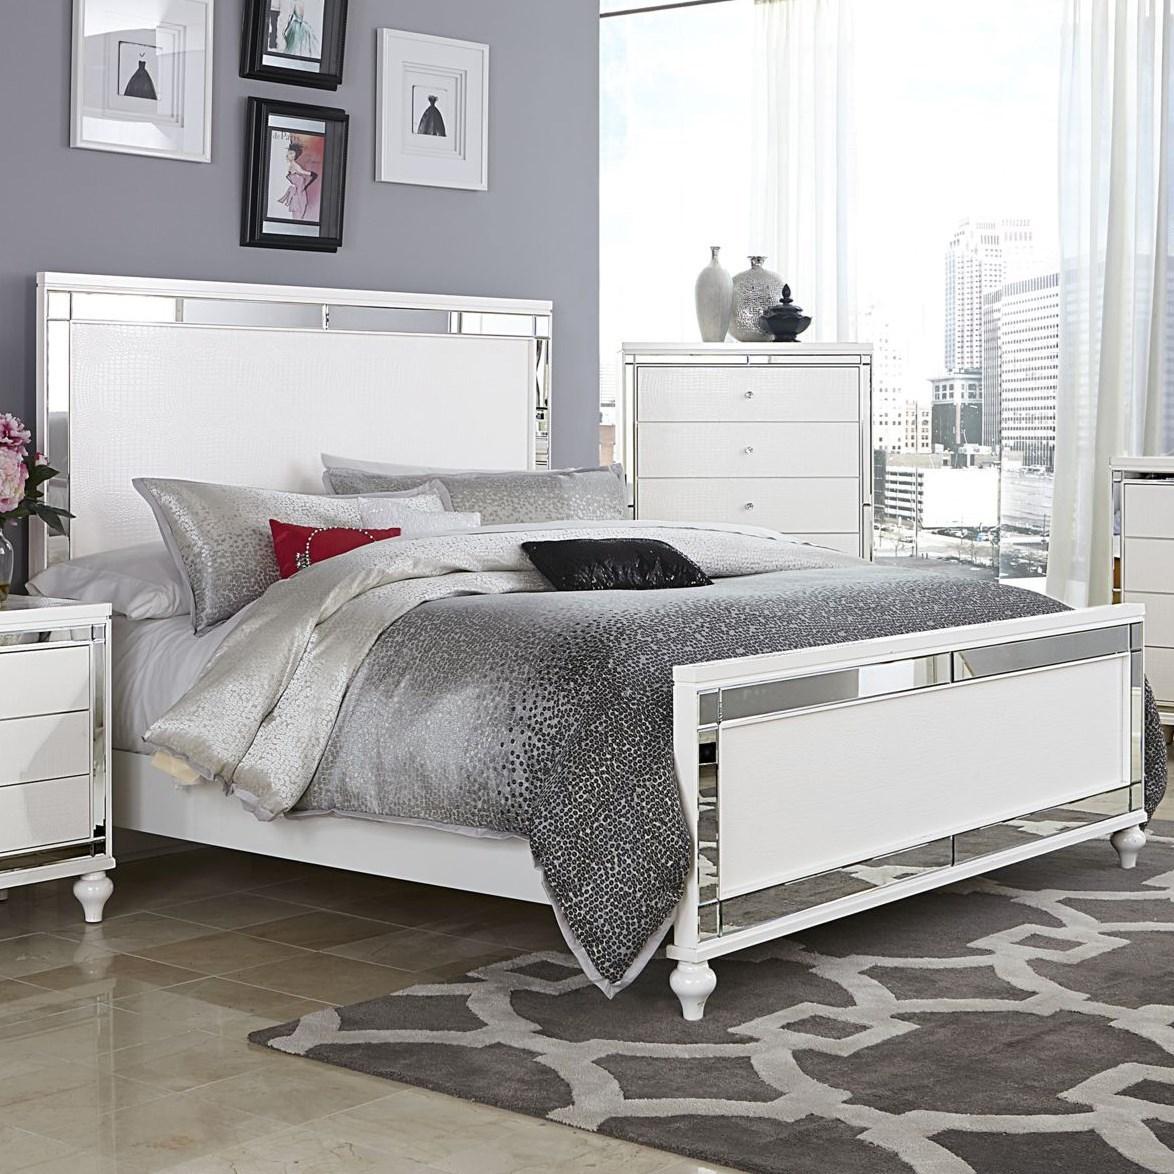 Alonza King Bed by Homelegance at Carolina Direct